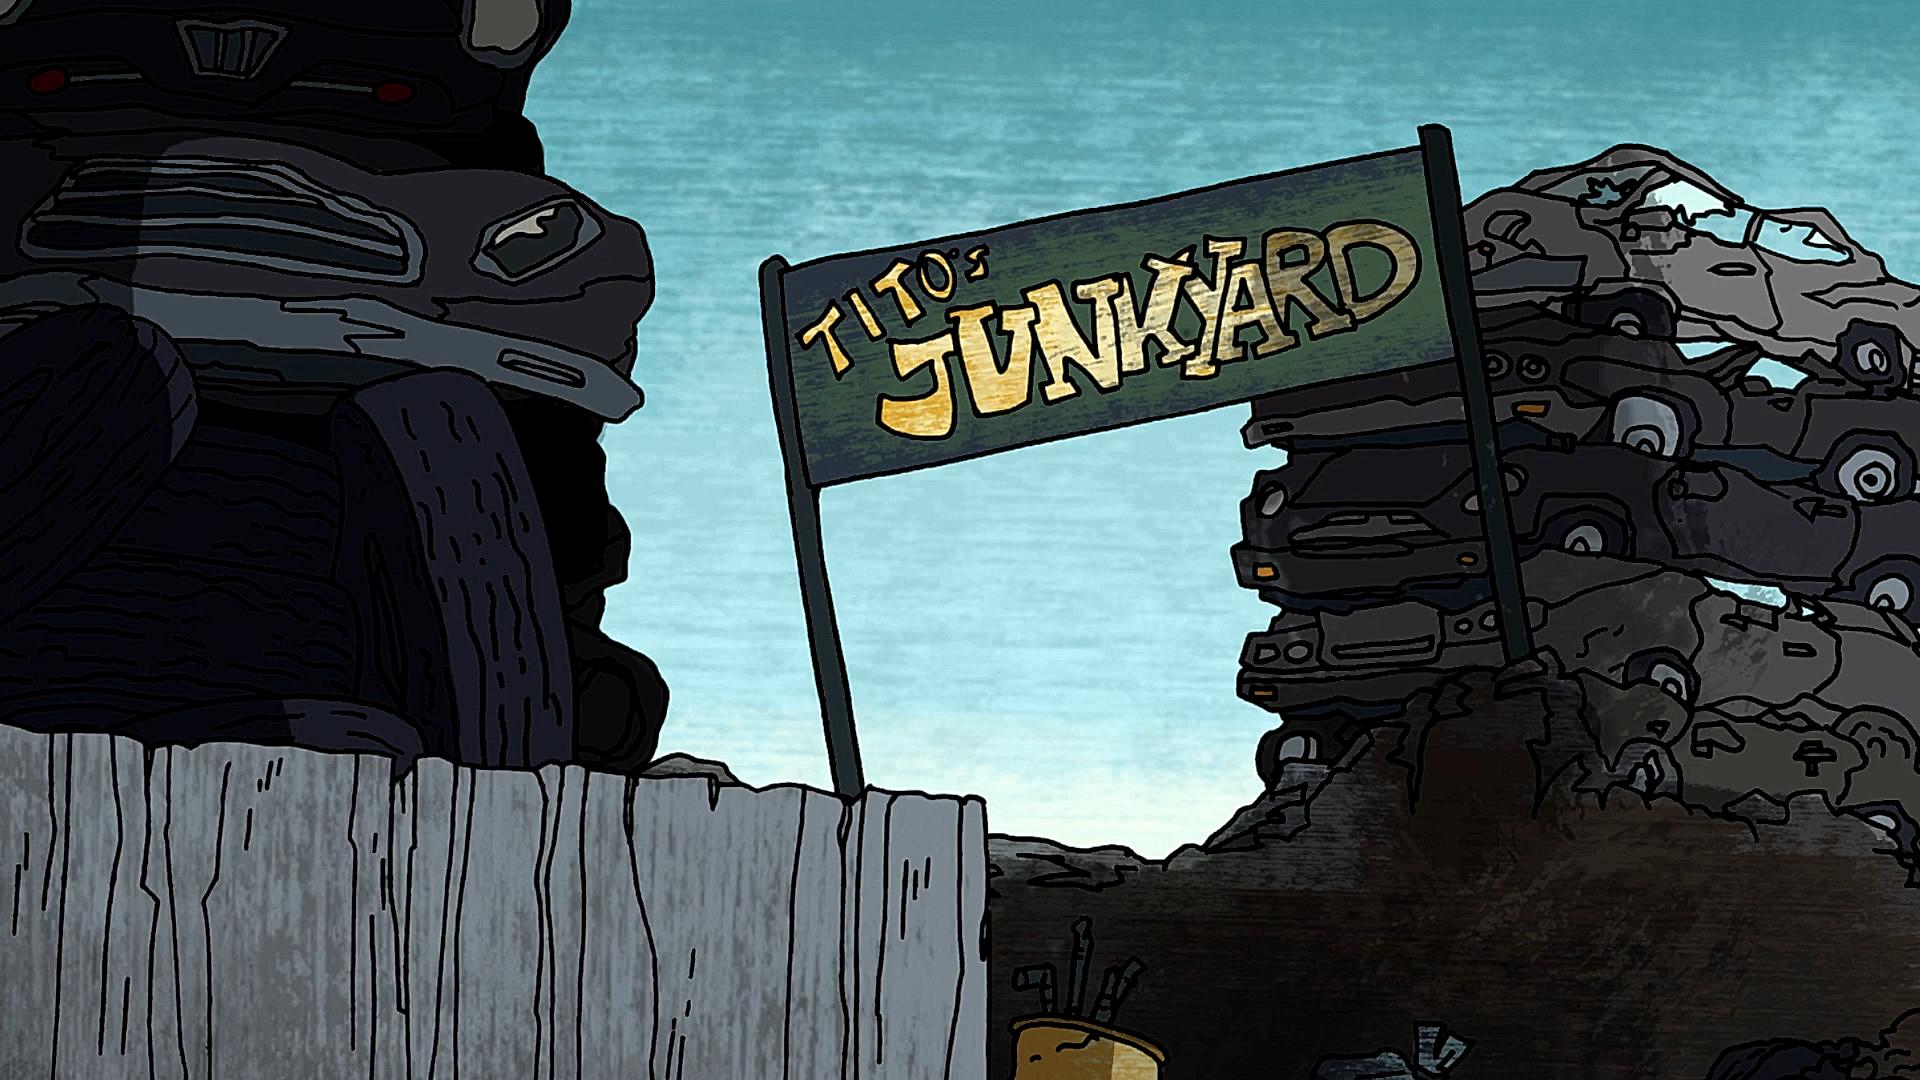 Tito's Junkyard